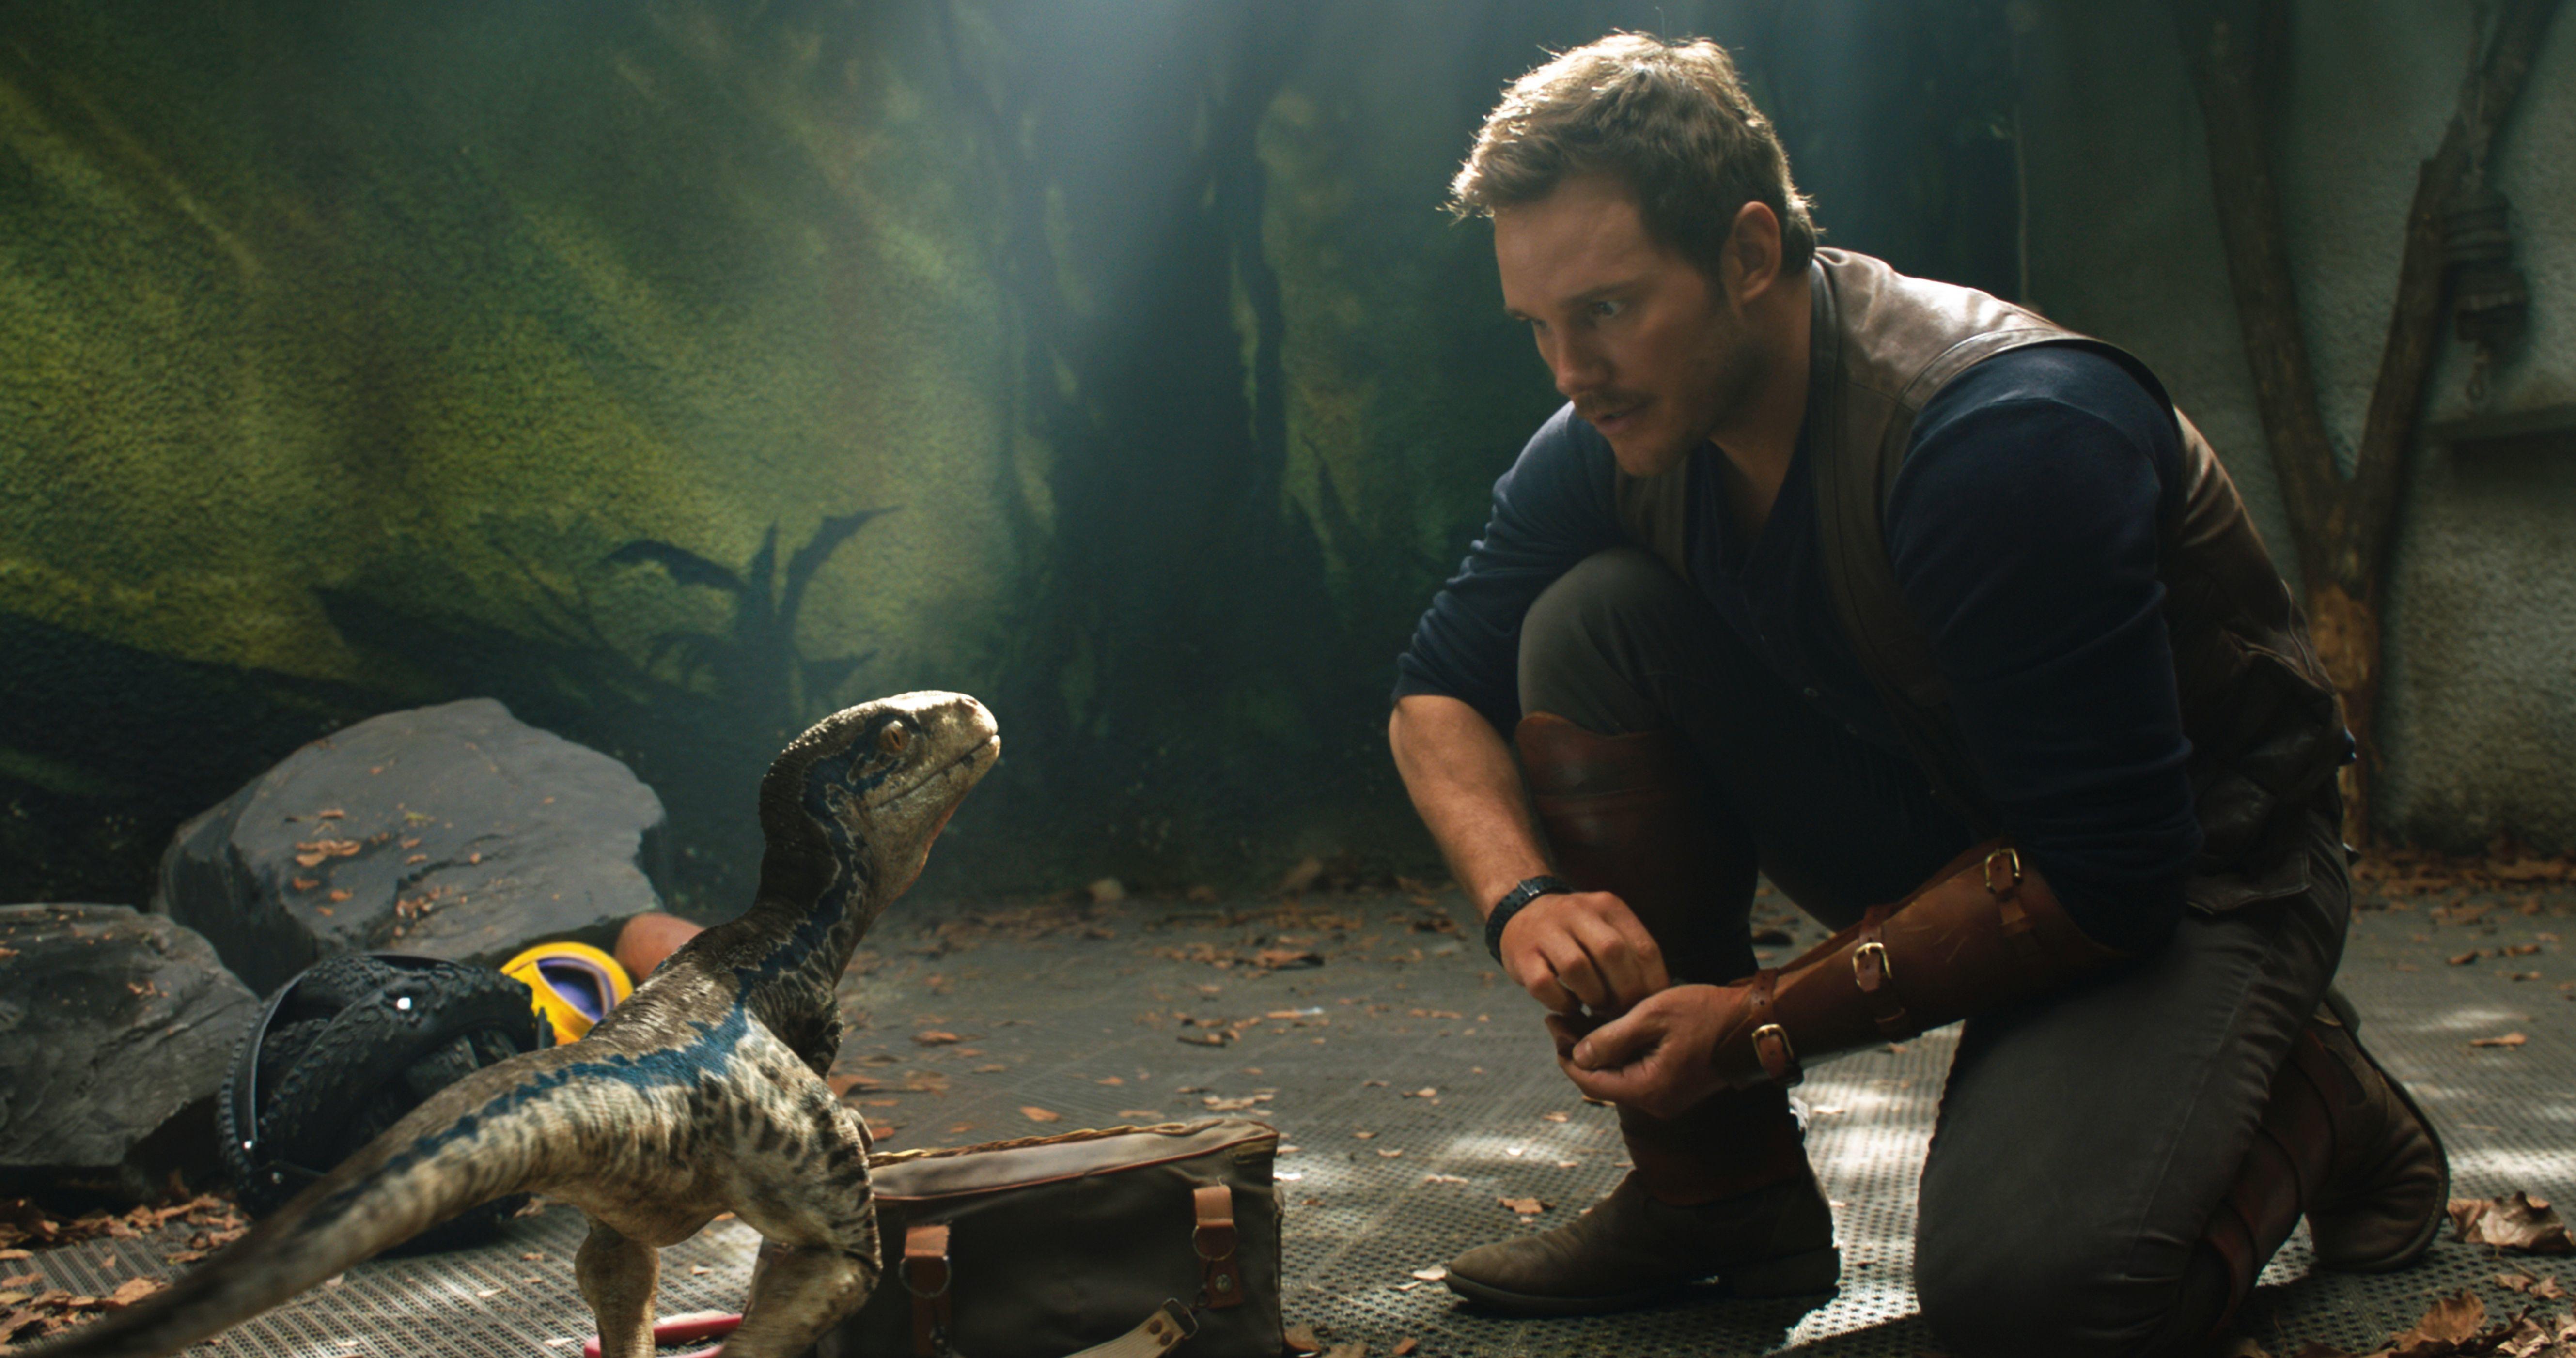 Chris Pratt And Little Raptor Jurassic World Wallpaper Hd